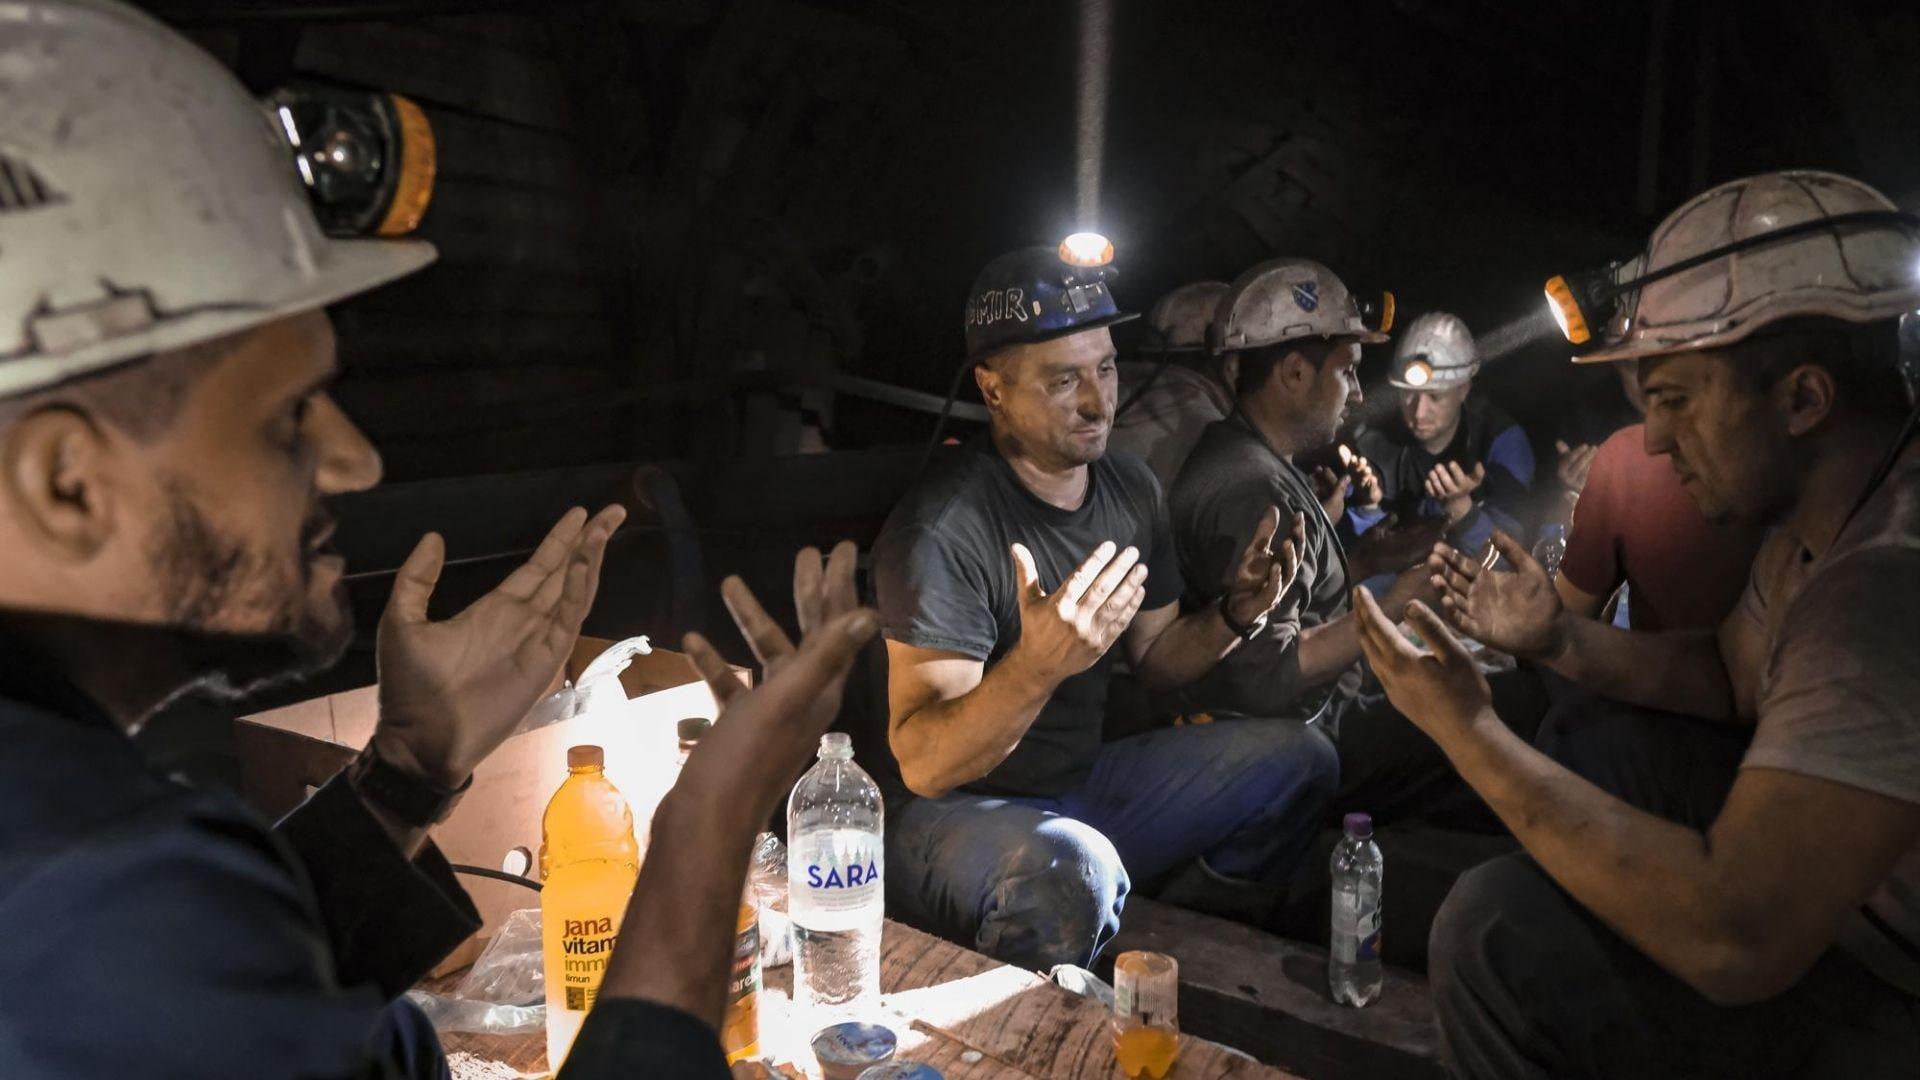 In Bosnia, Muslim miners mark Ramadan underground; pray and break fast underground